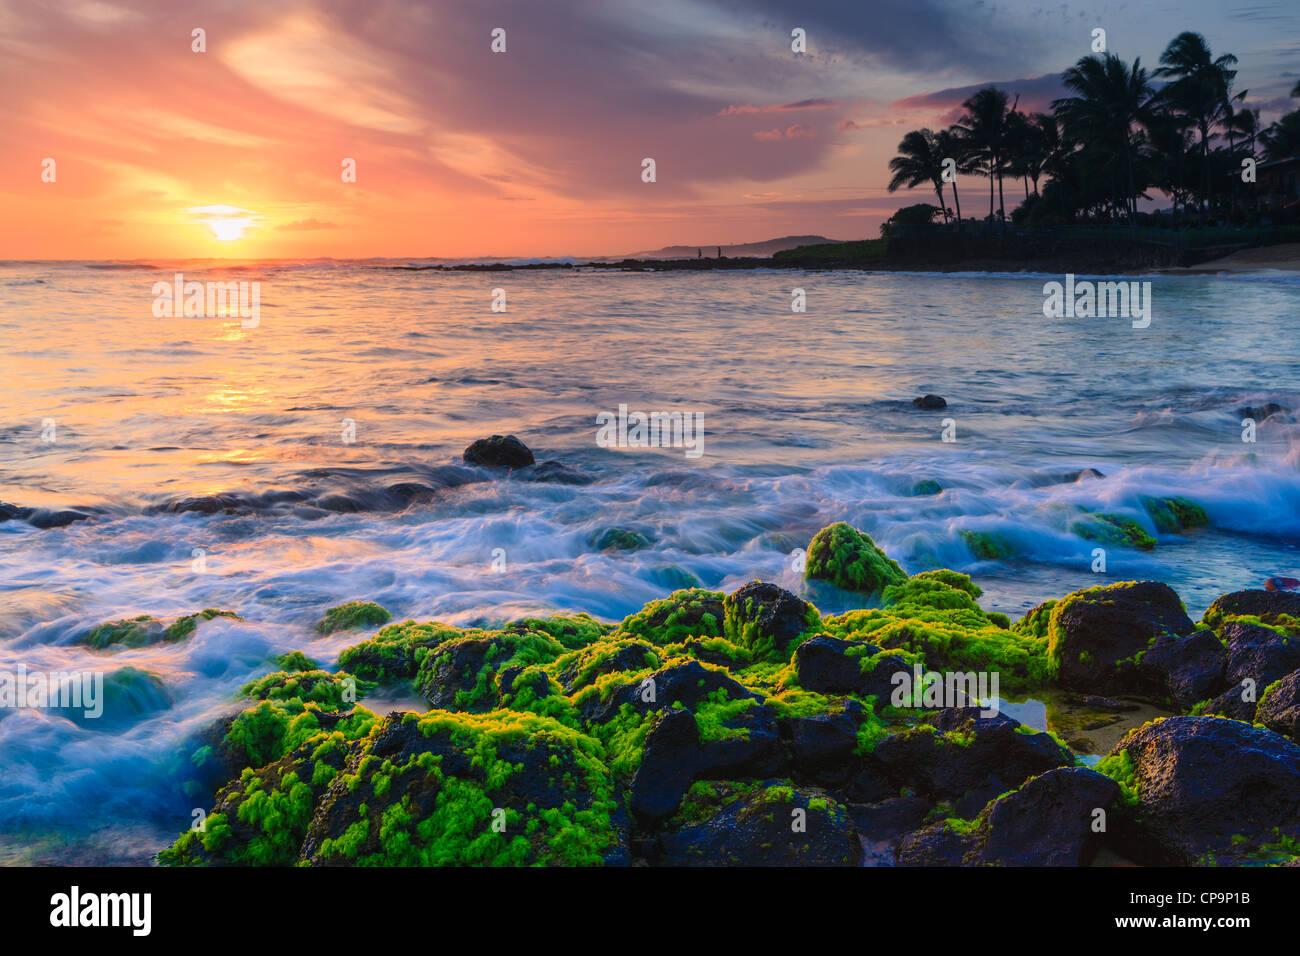 El atardecer en la famosa Playa Poipu, Kauai, Hawai Imagen De Stock